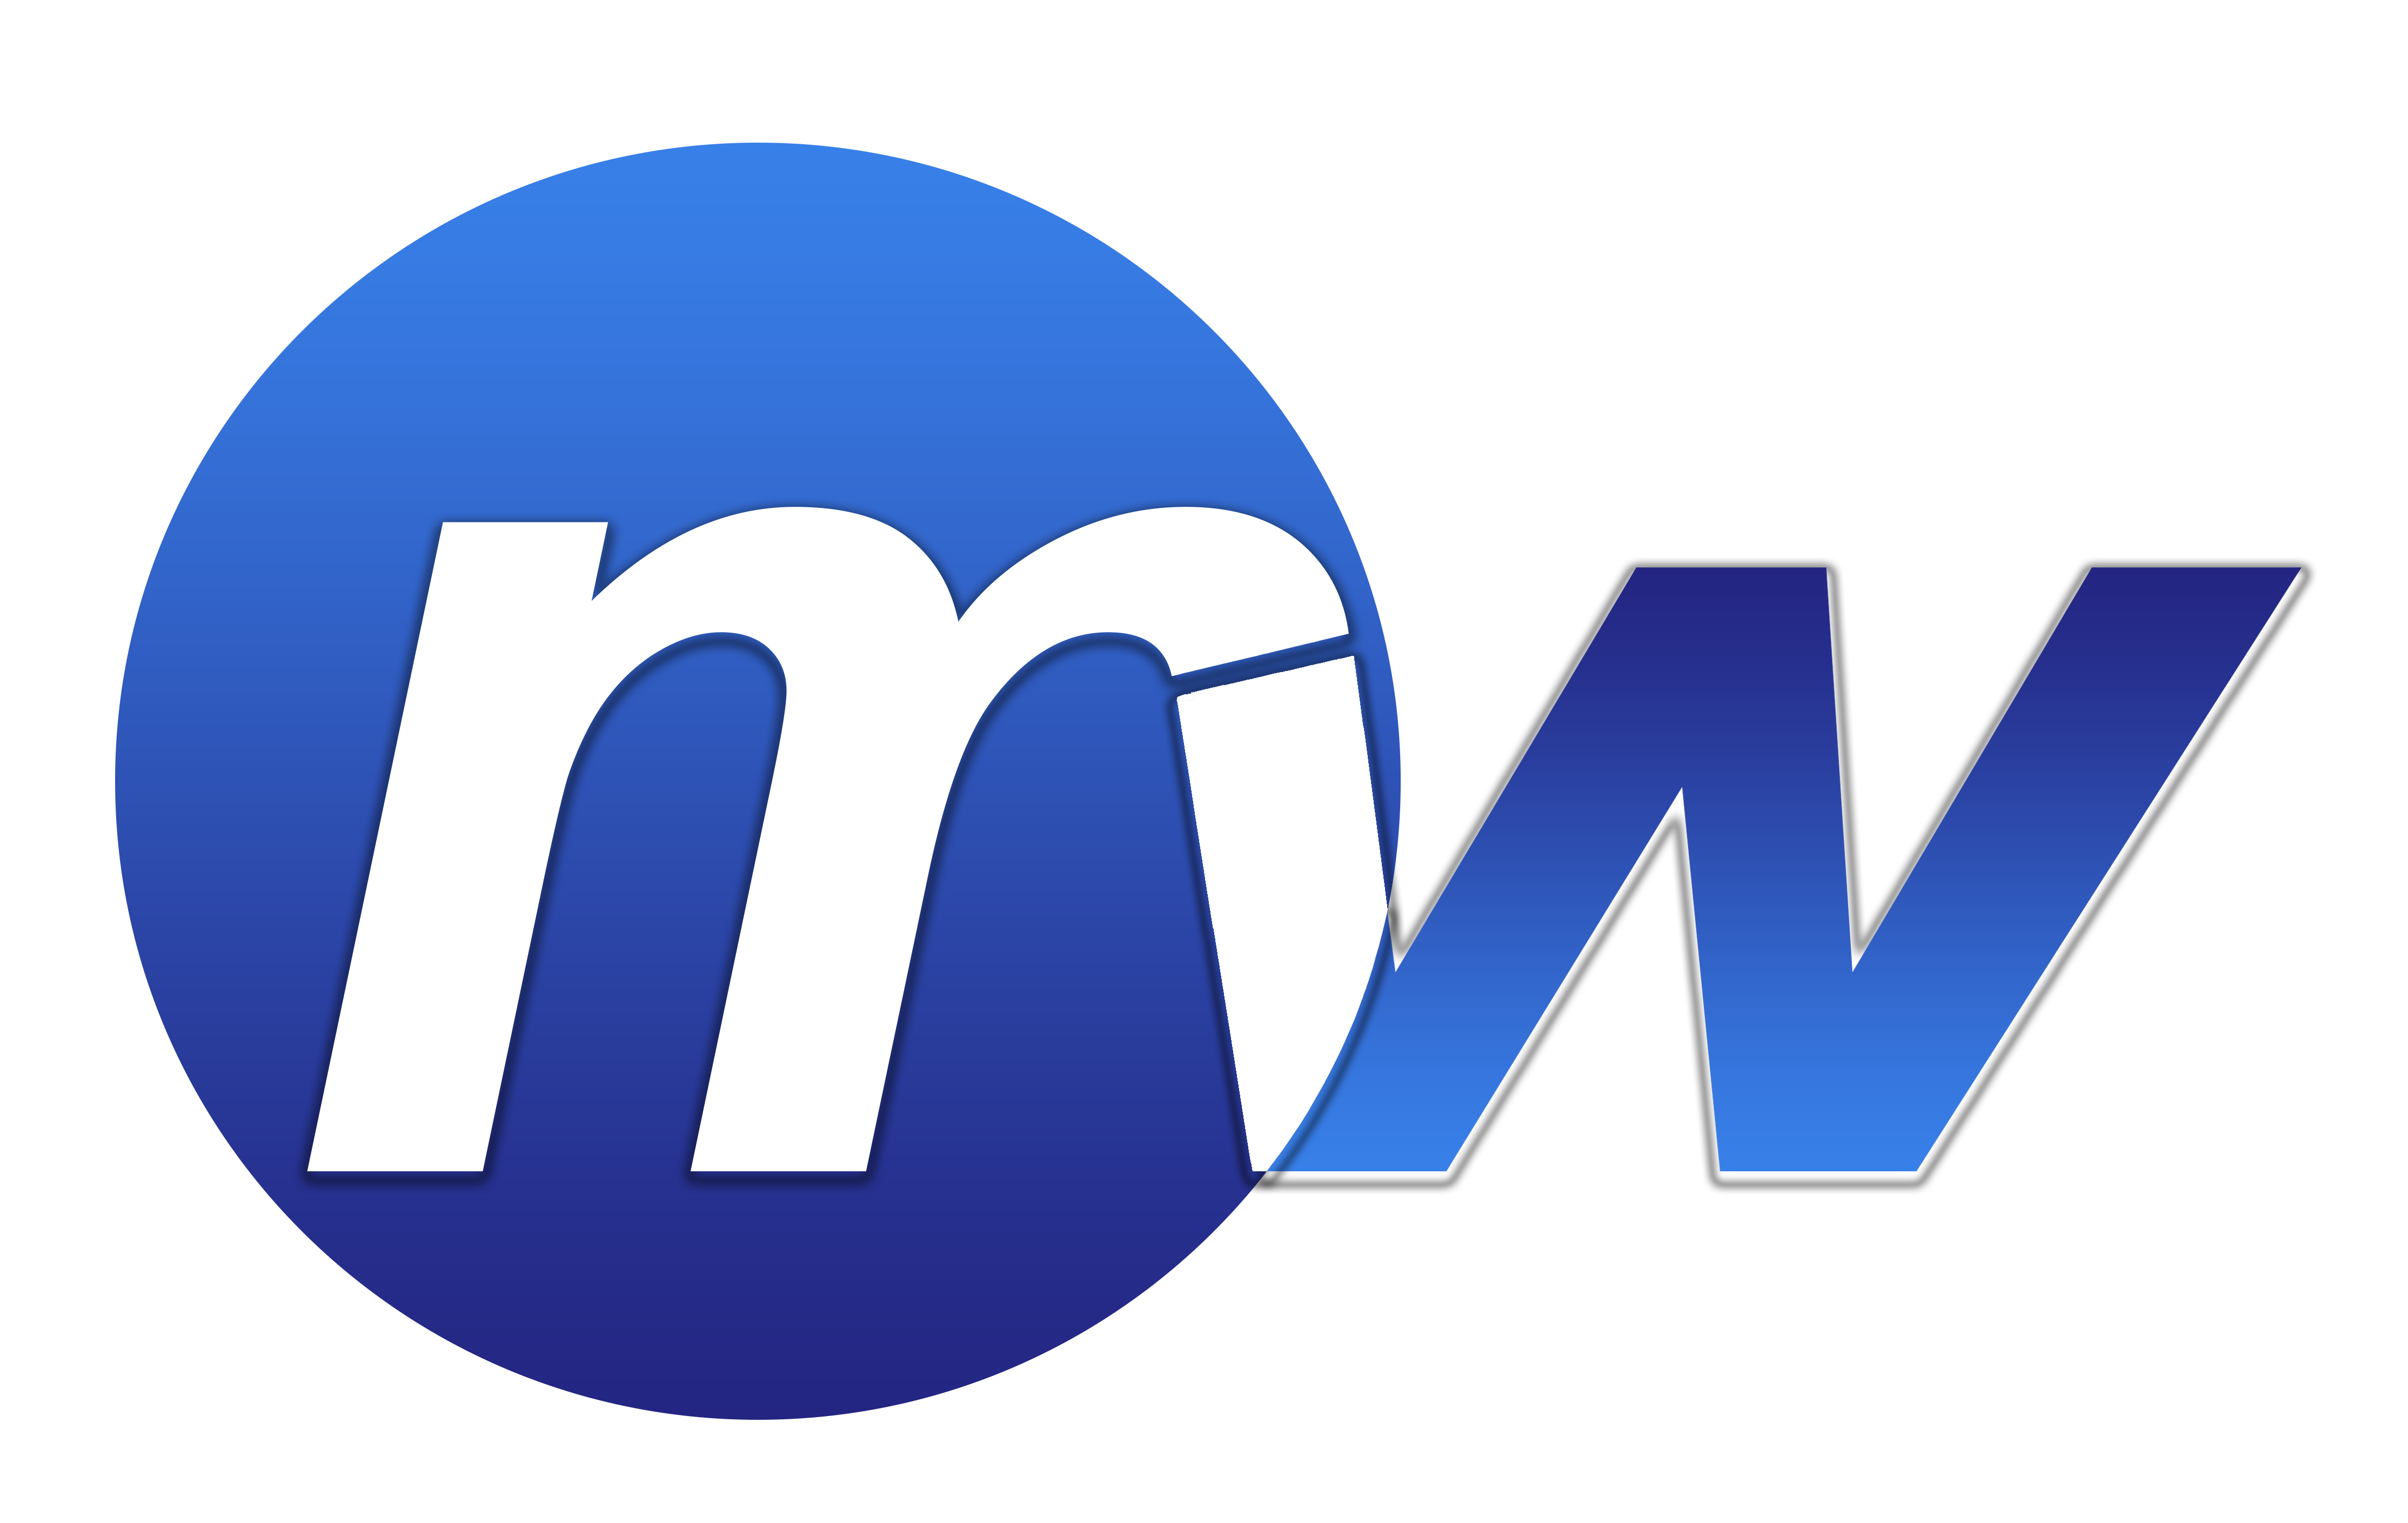 Mitaway